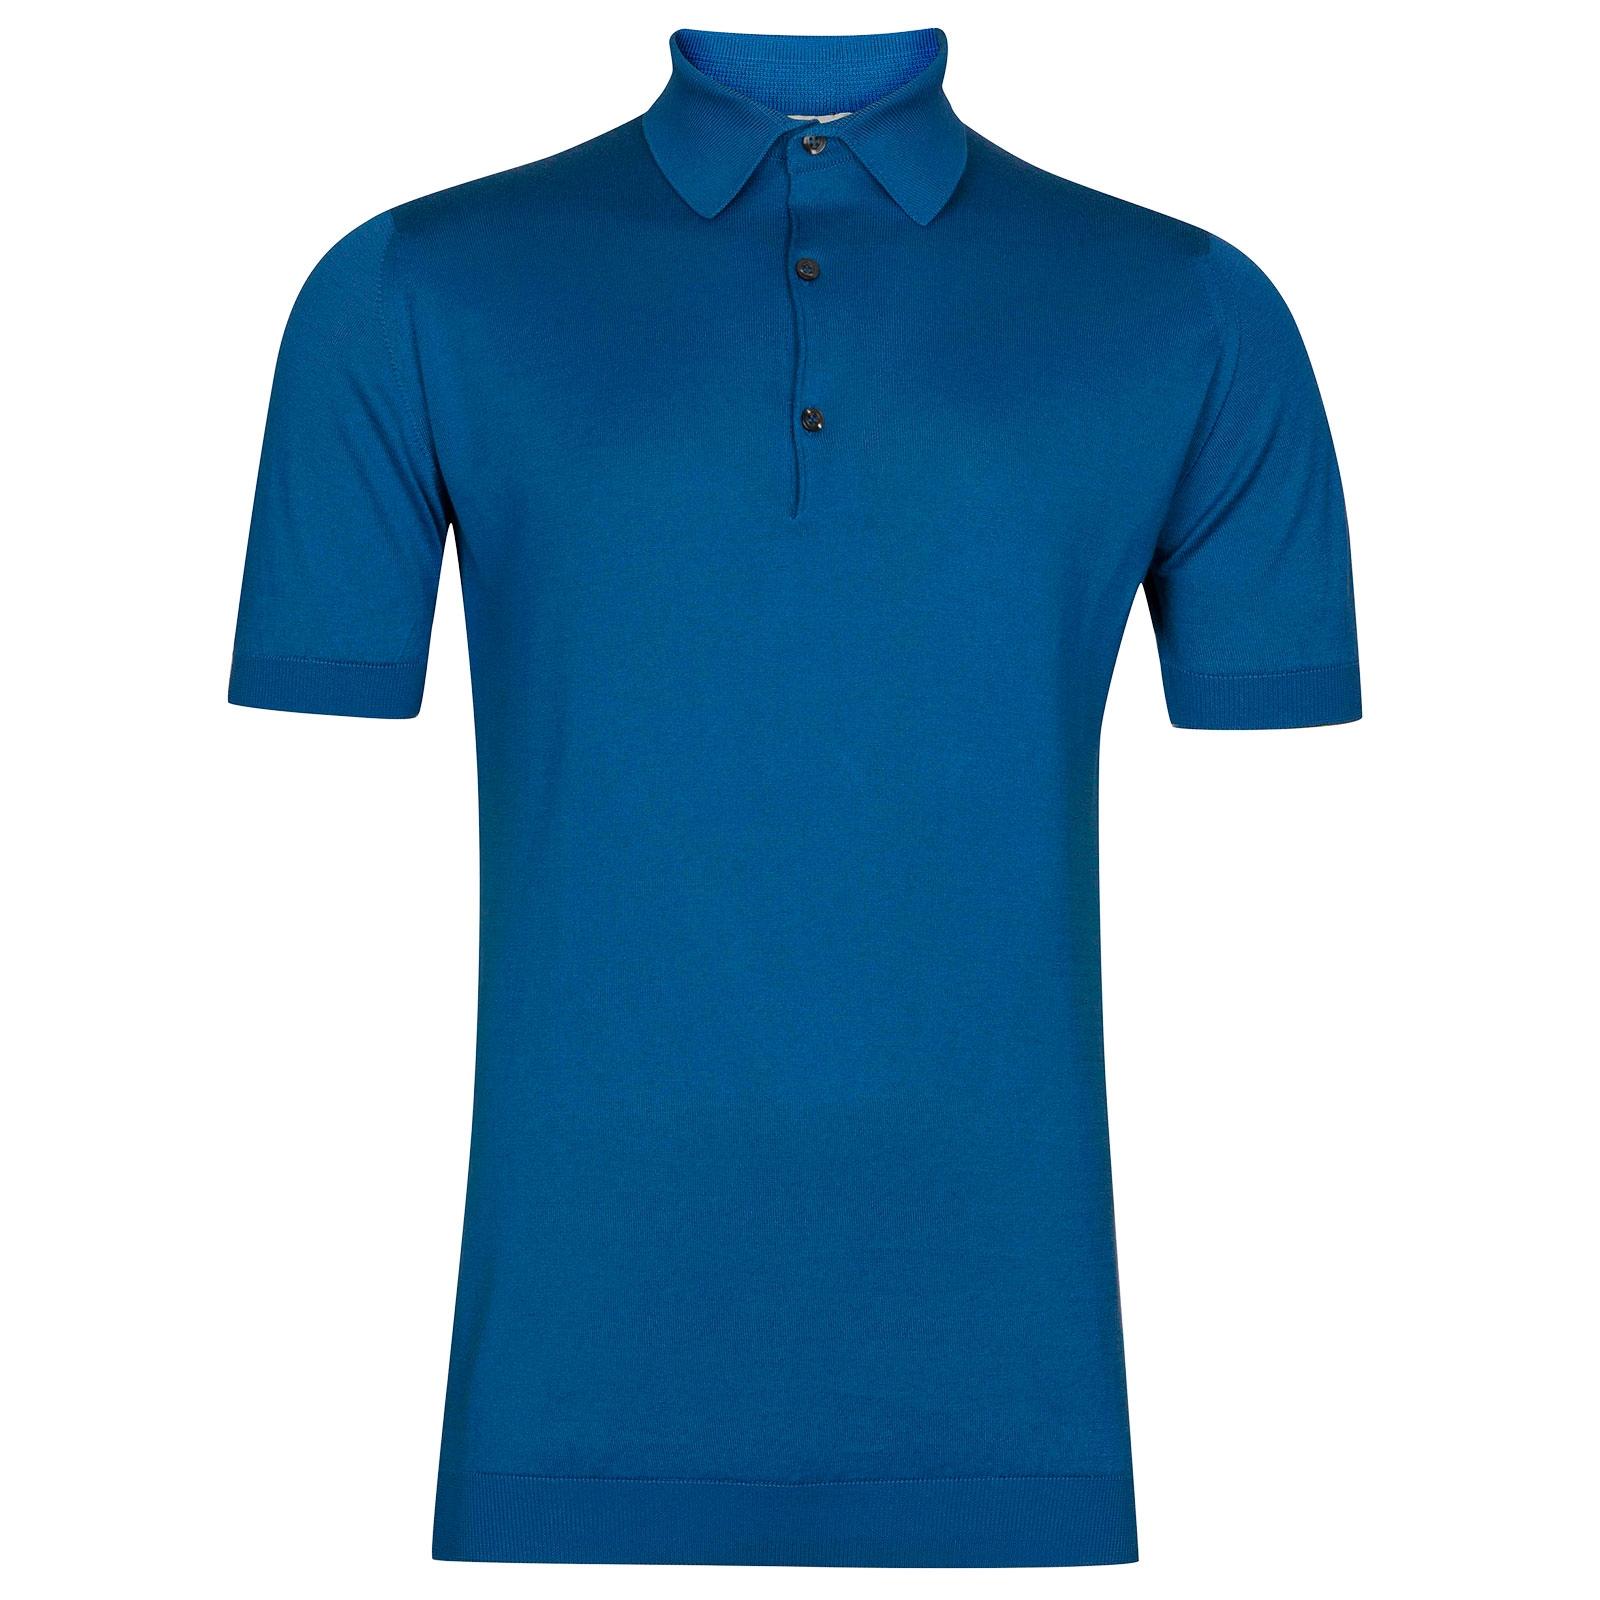 John Smedley Adrian in Statice Blue Shirt-LGE